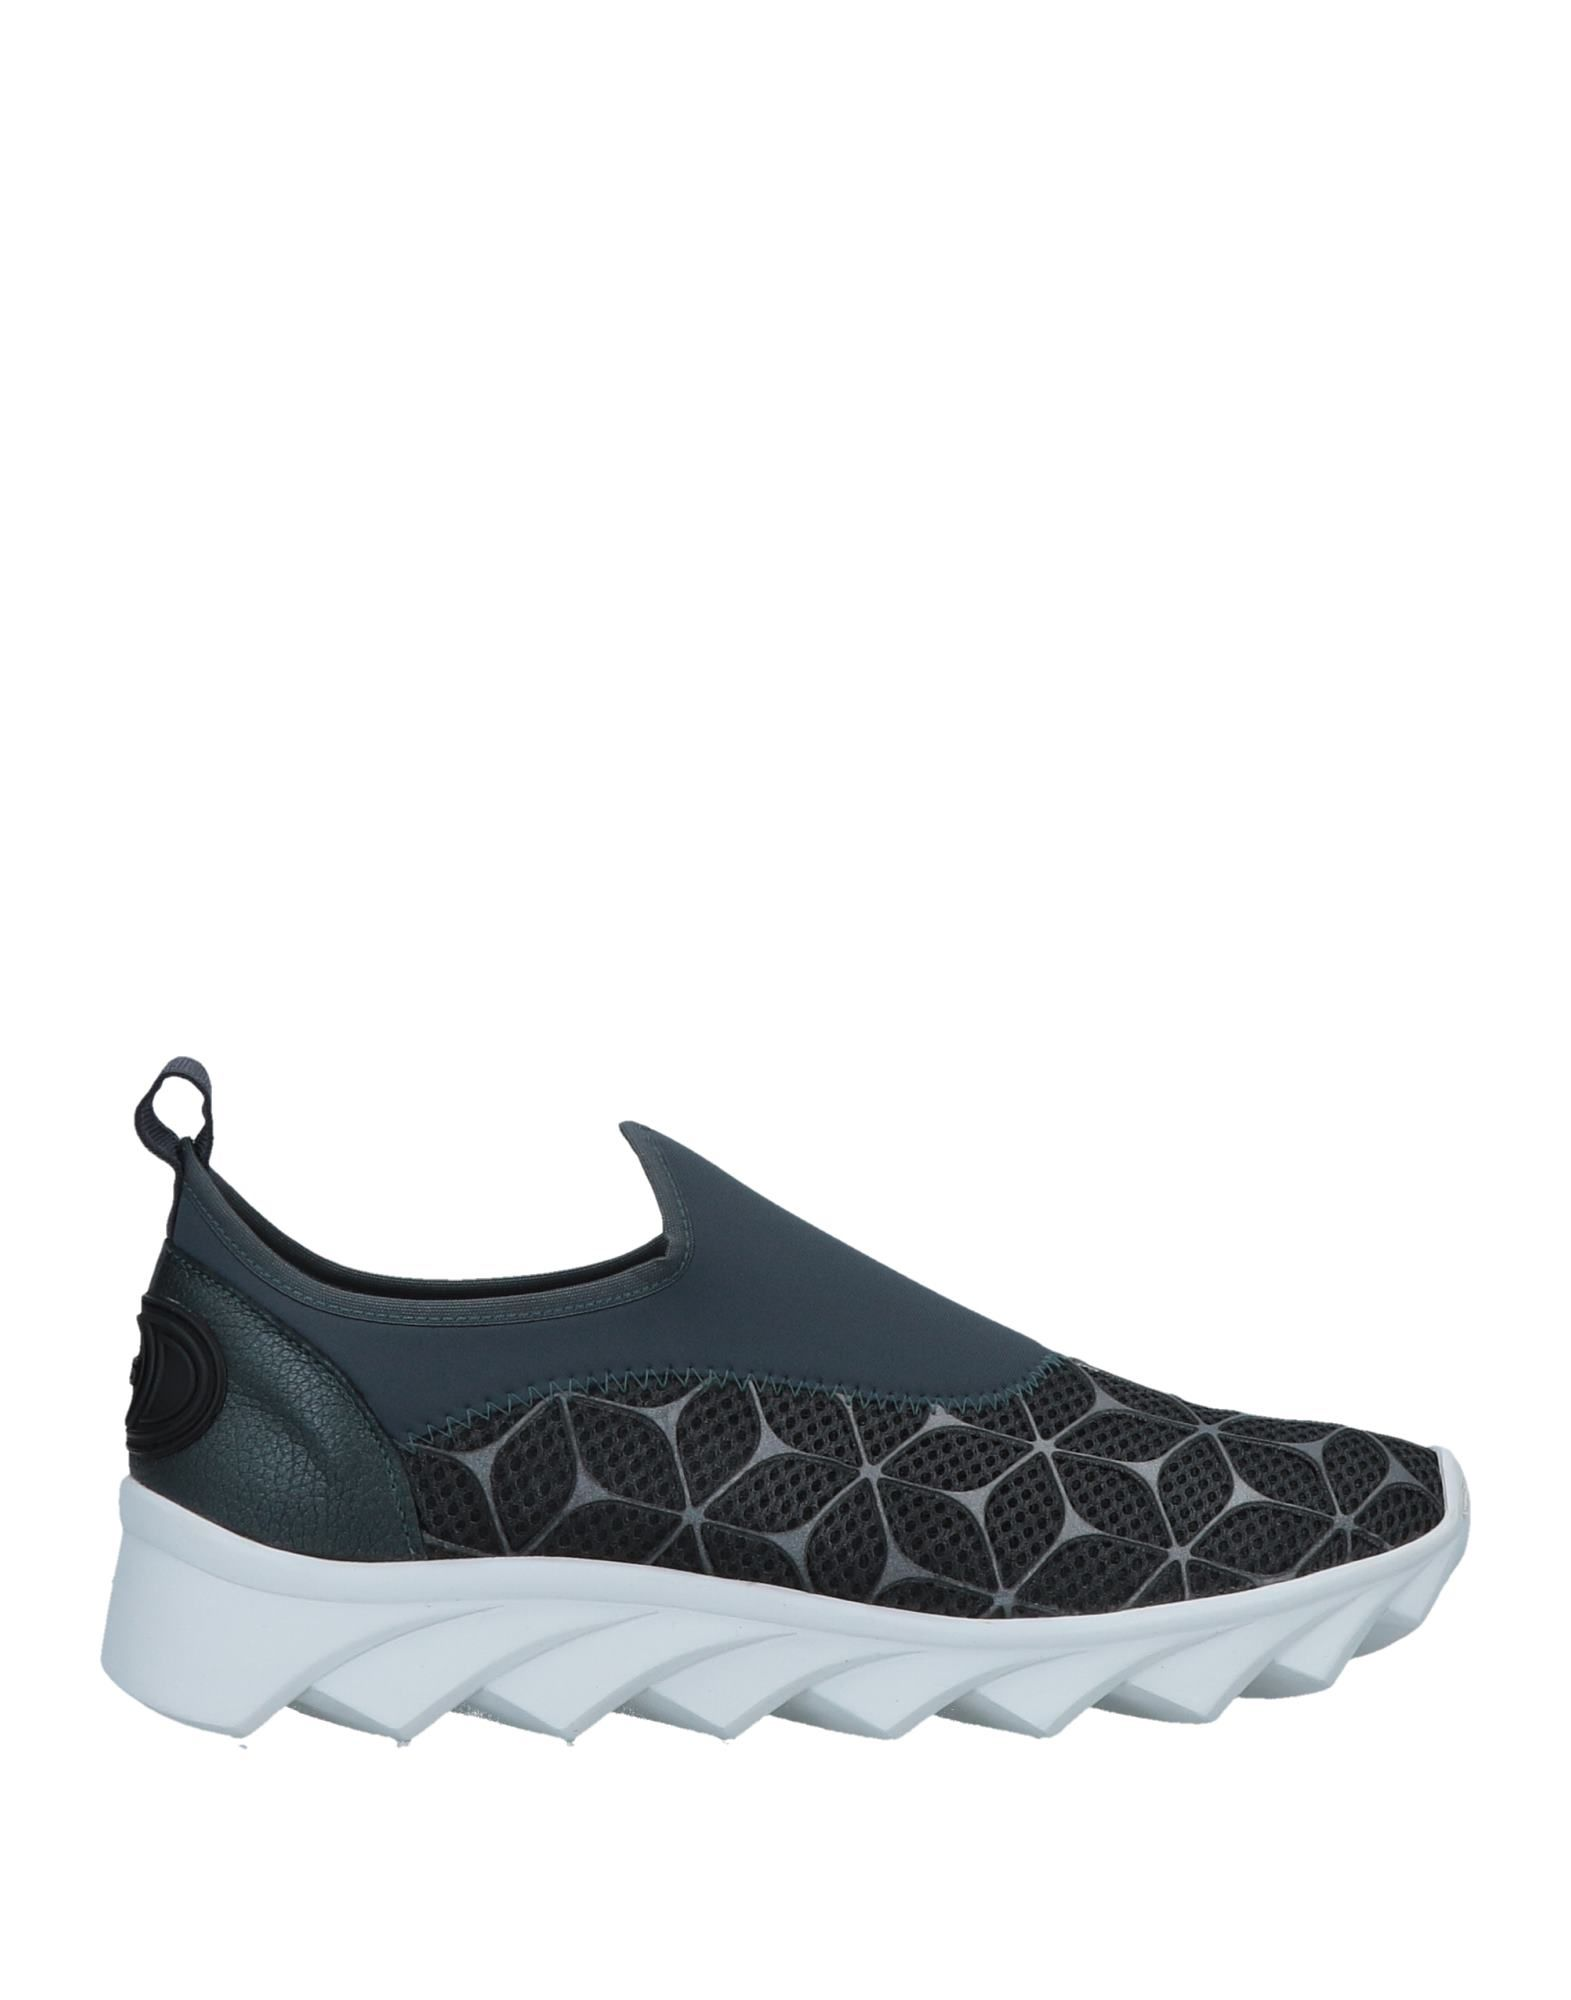 Ras Gute Sneakers Damen  11511496QI Gute Ras Qualität beliebte Schuhe 1519f9